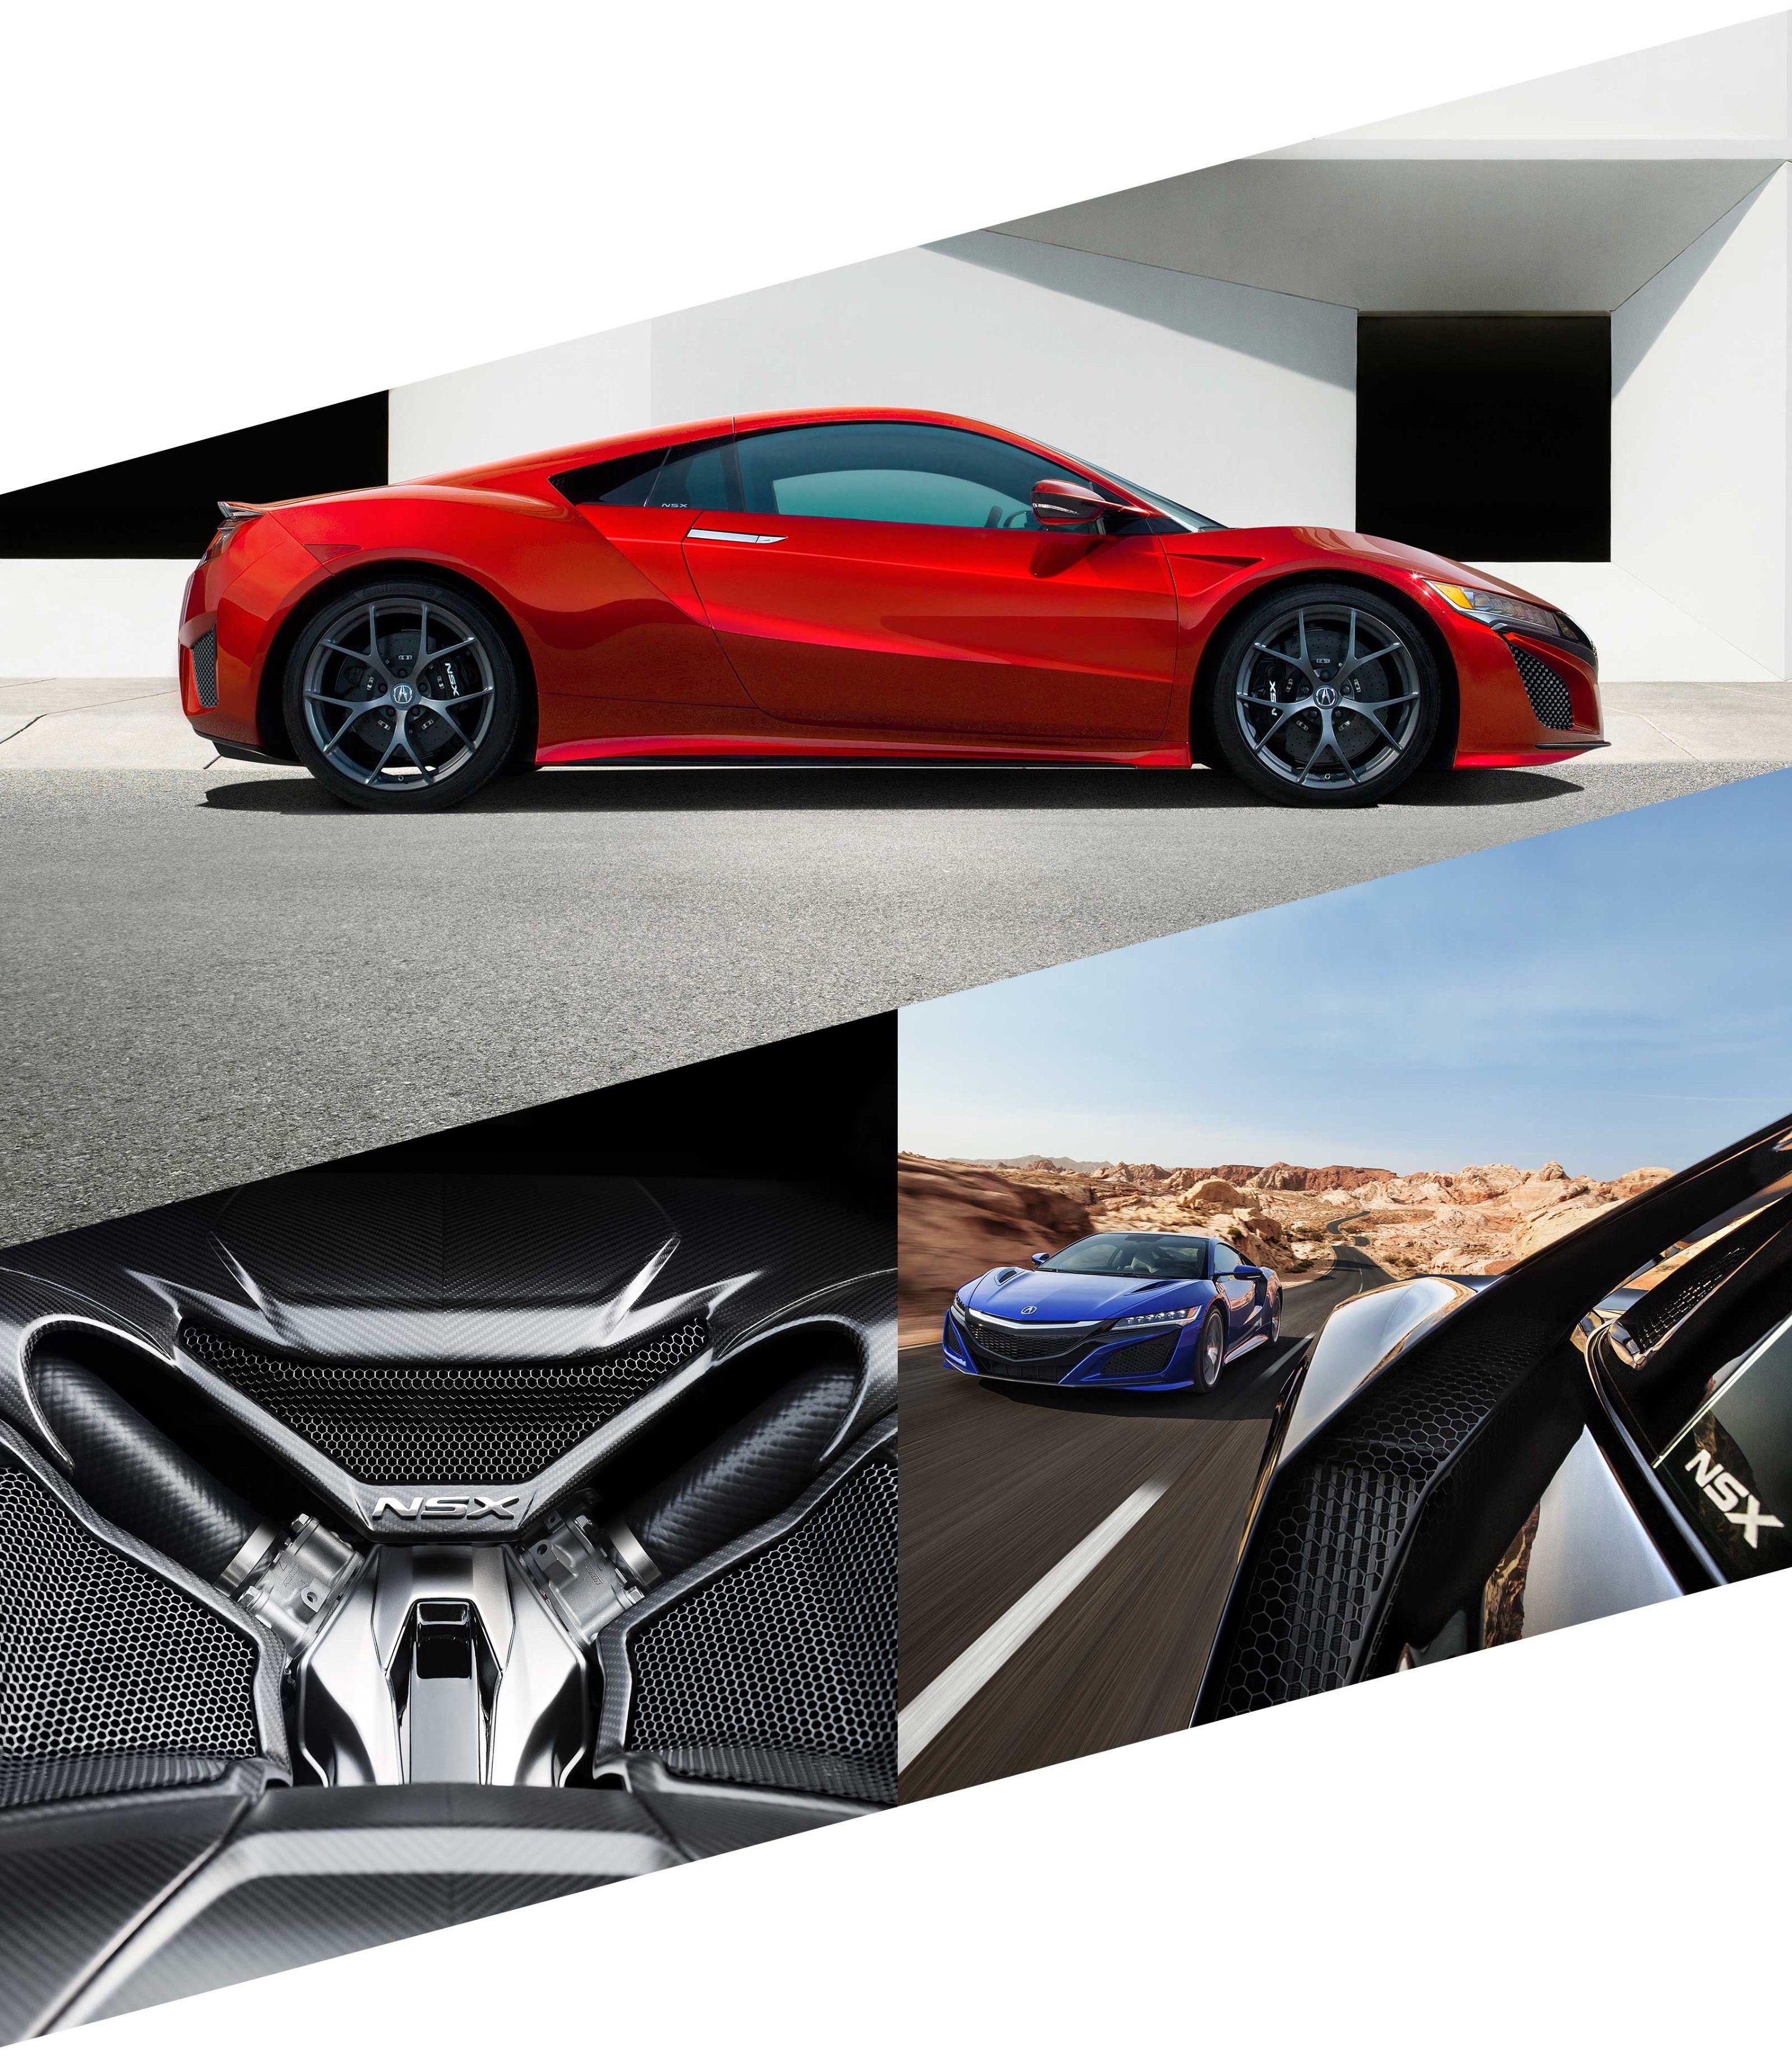 2018 Acura NSX – Next-Generation Supercar